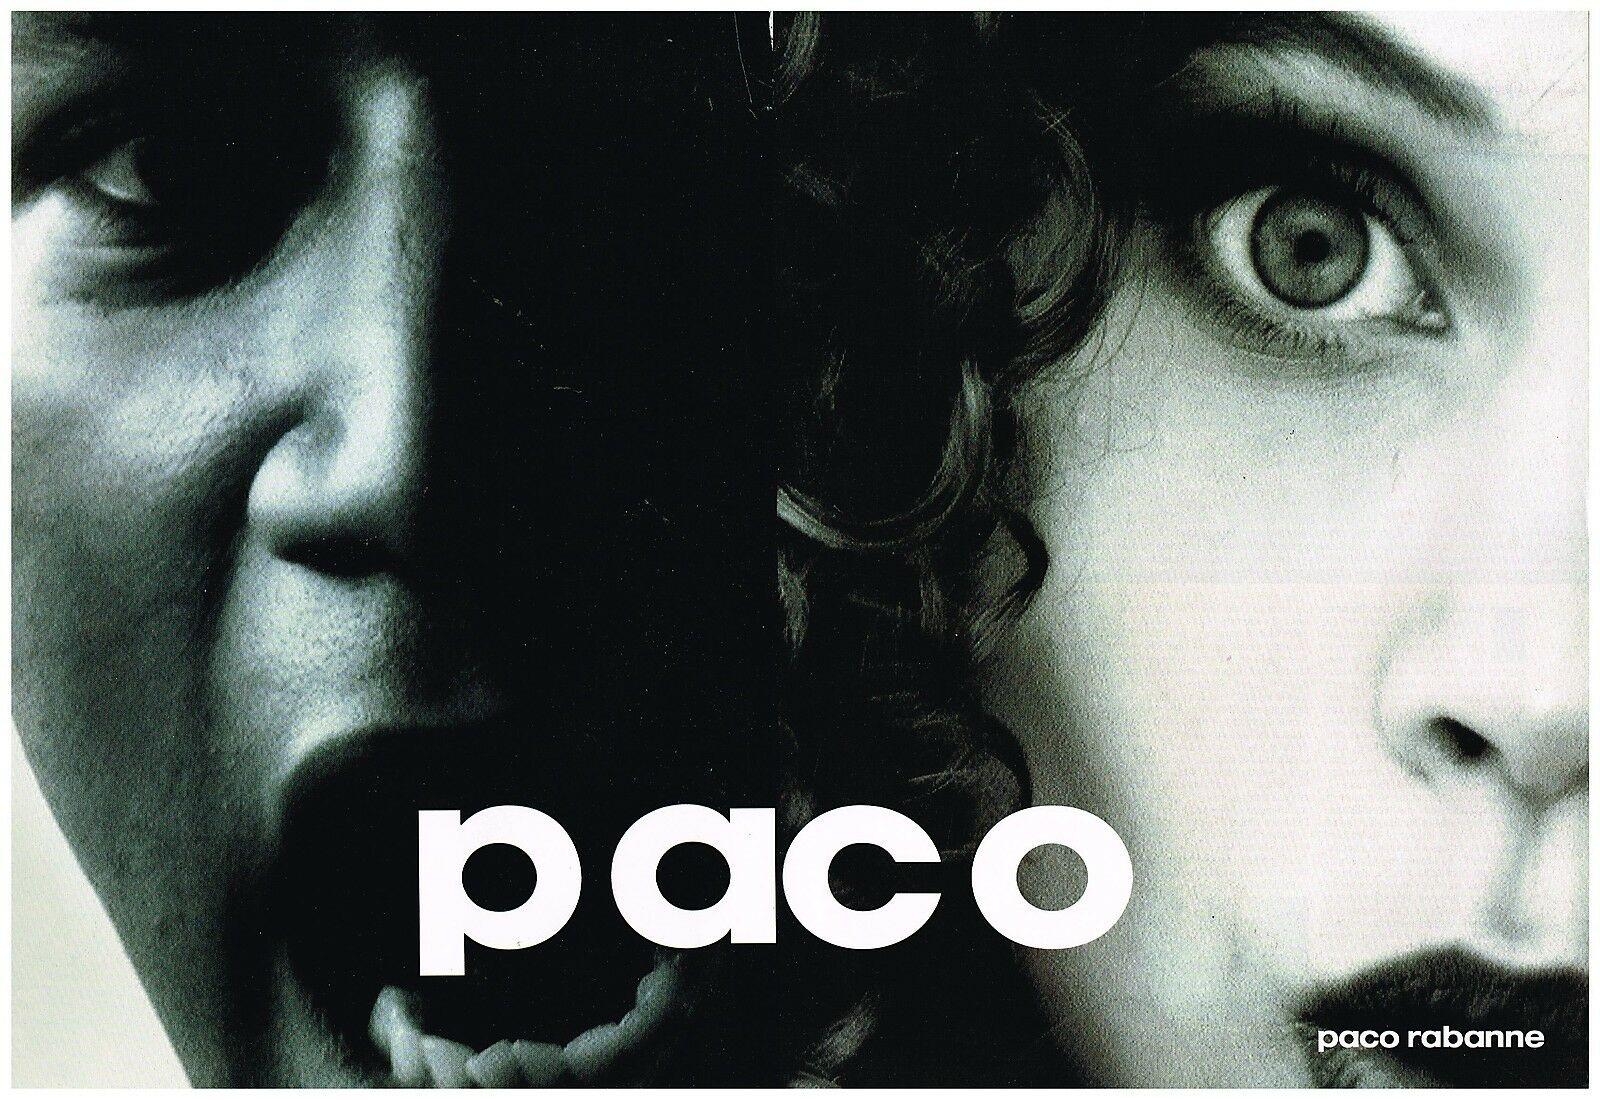 1996 Paco rabanne